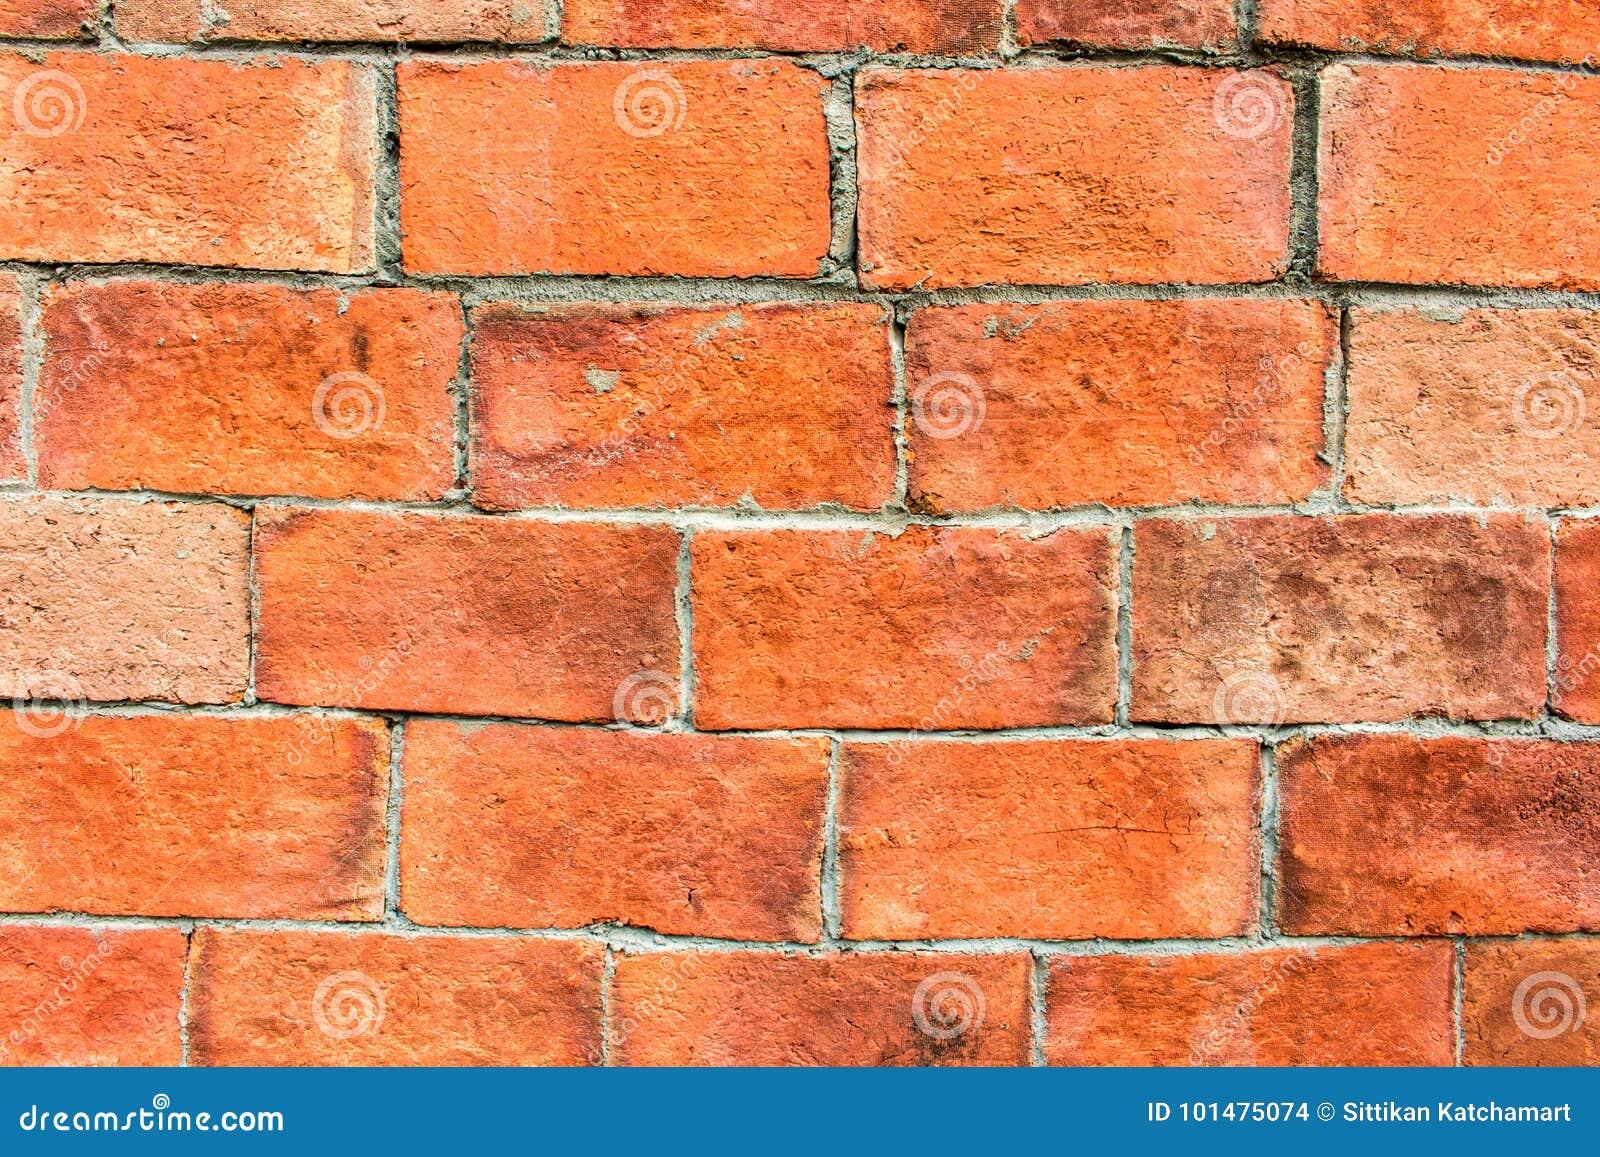 Z Brick Flooring : The floor brick of texture stock photo image design